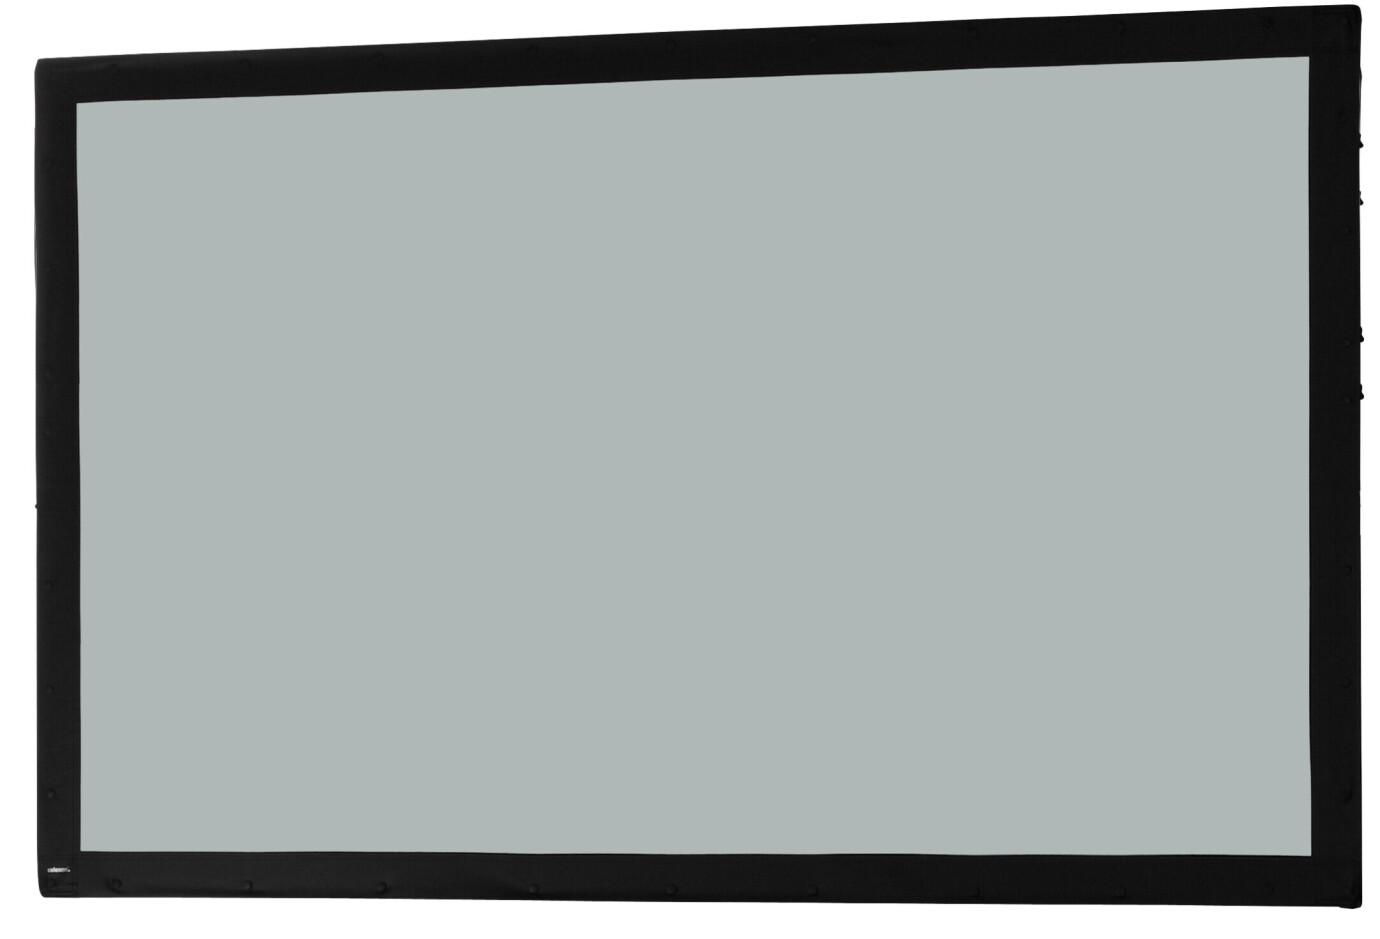 celexon Tuch für Faltrahmen Mobil Expert - 406 x 254 cm Rückprojektion